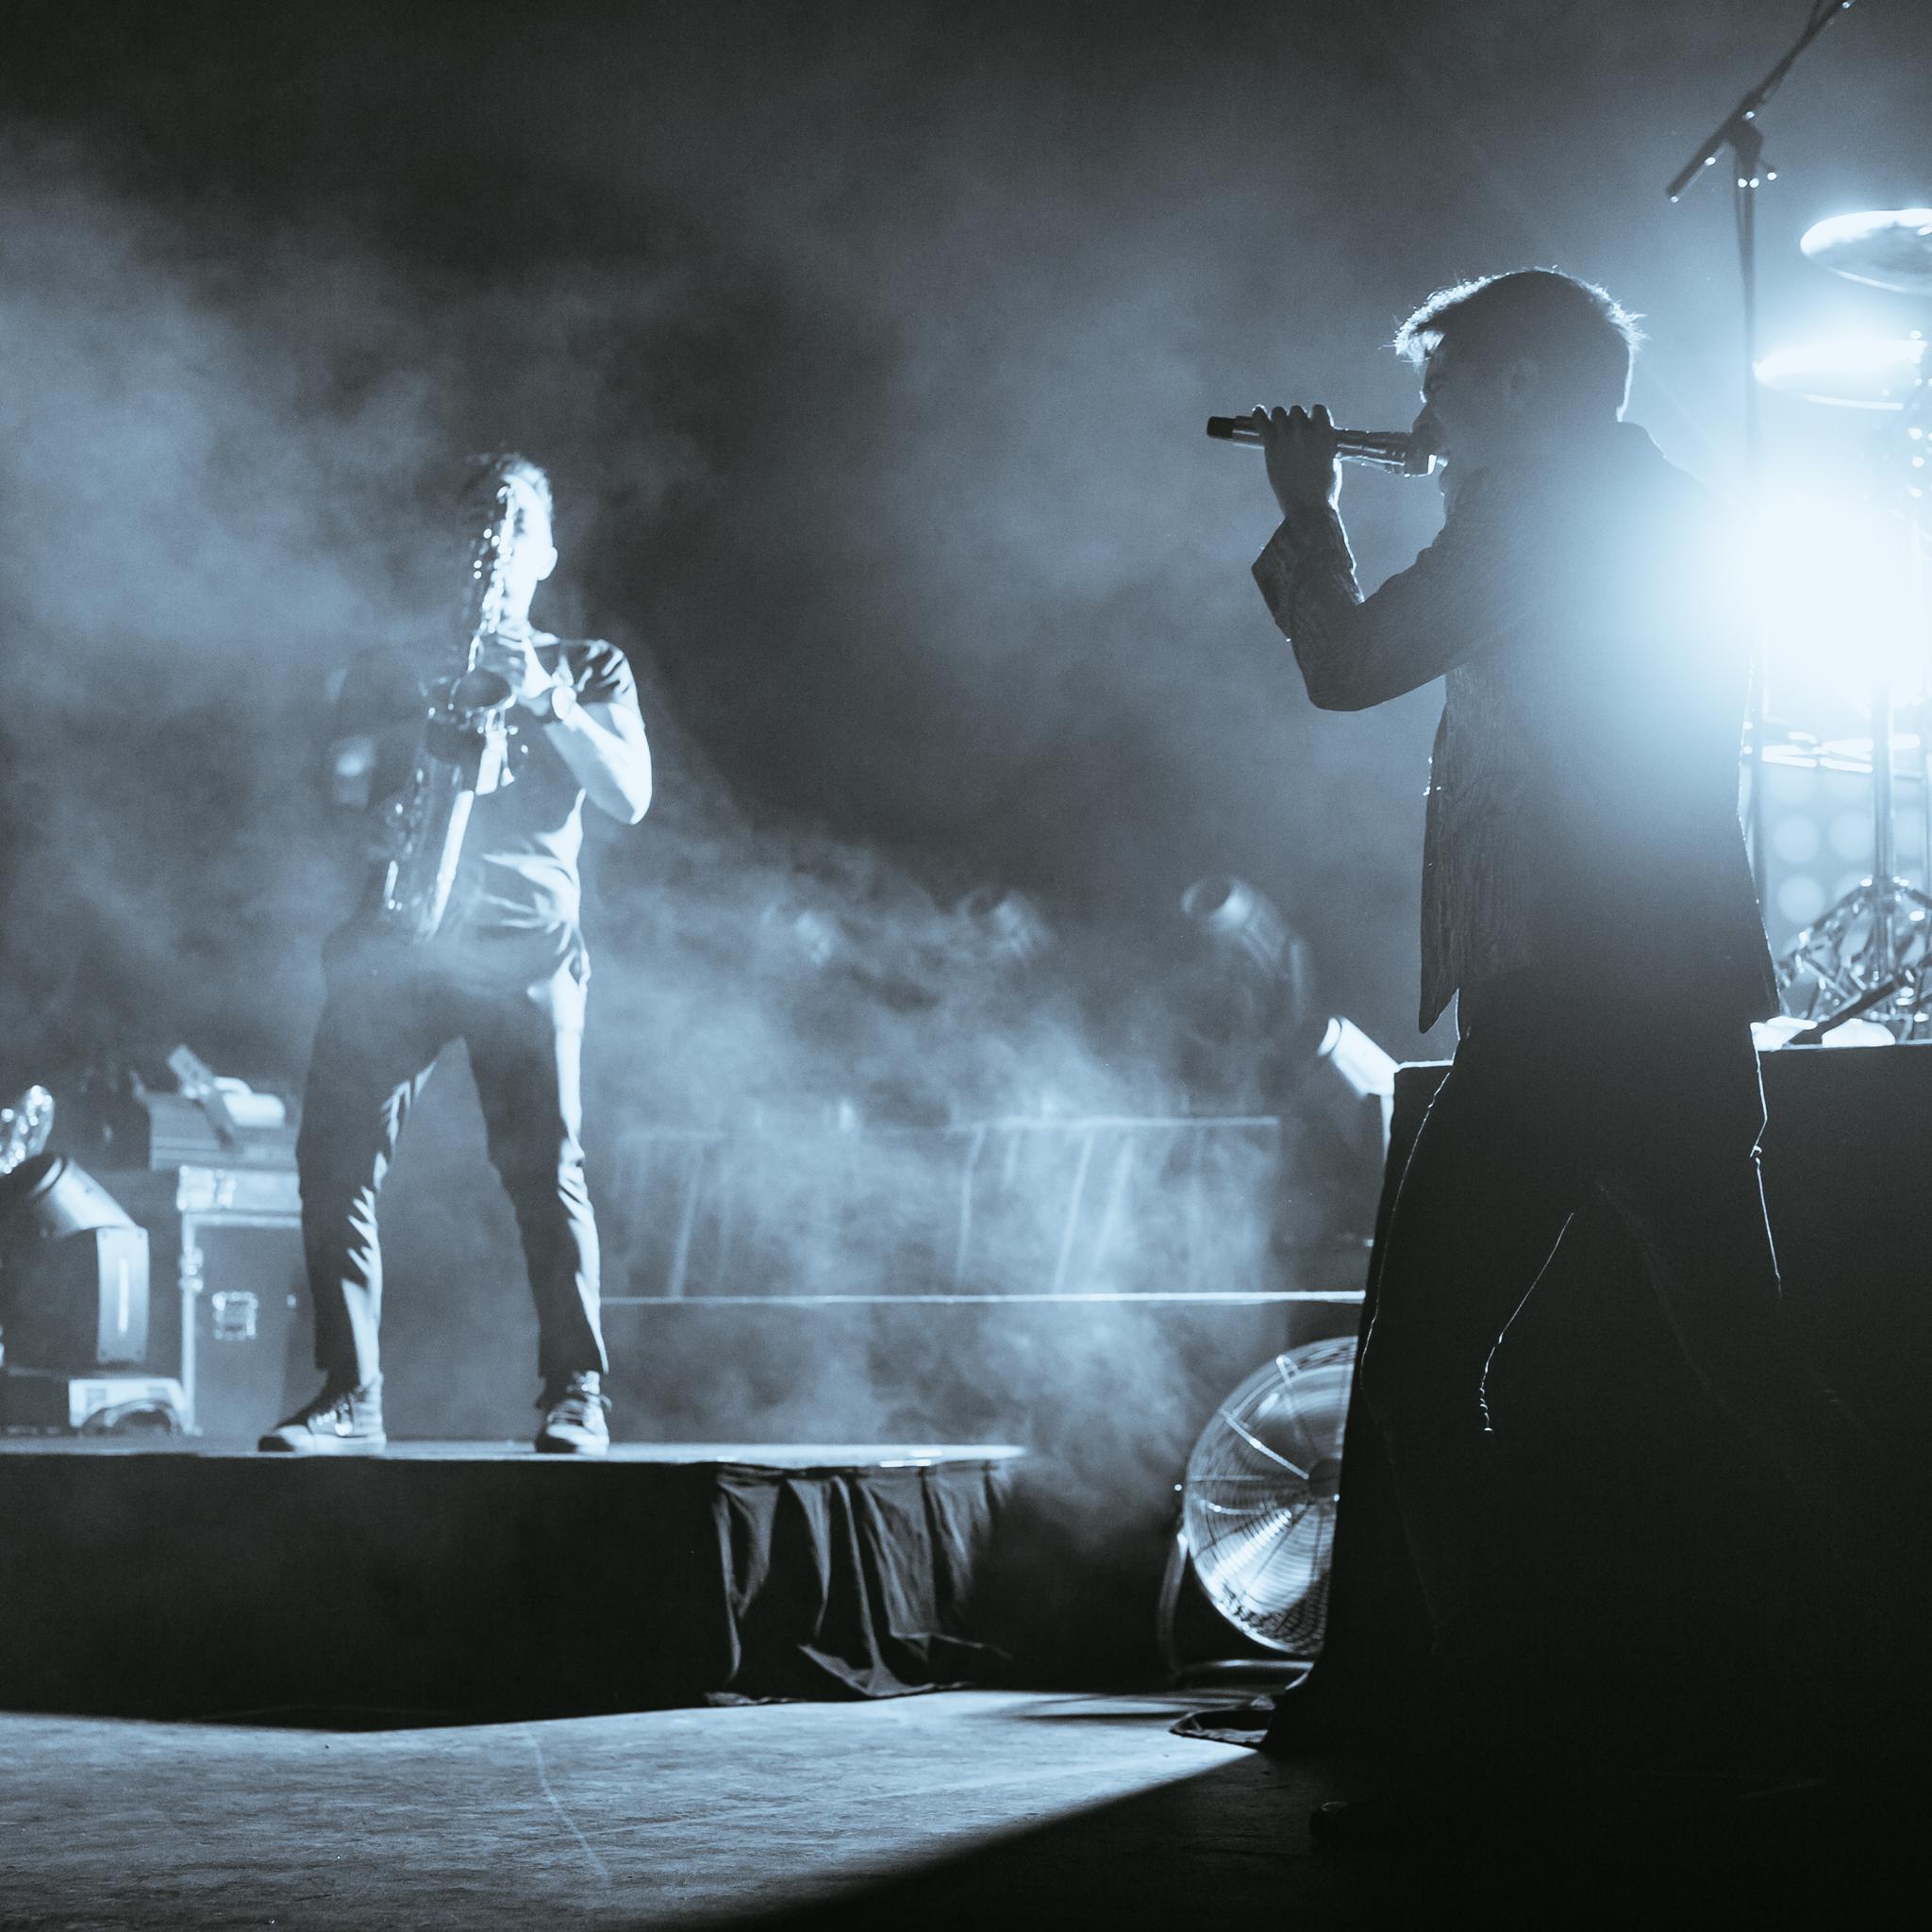 Mitch Lowe Photo - Panic At The Disco - Riverstage-11.jpg